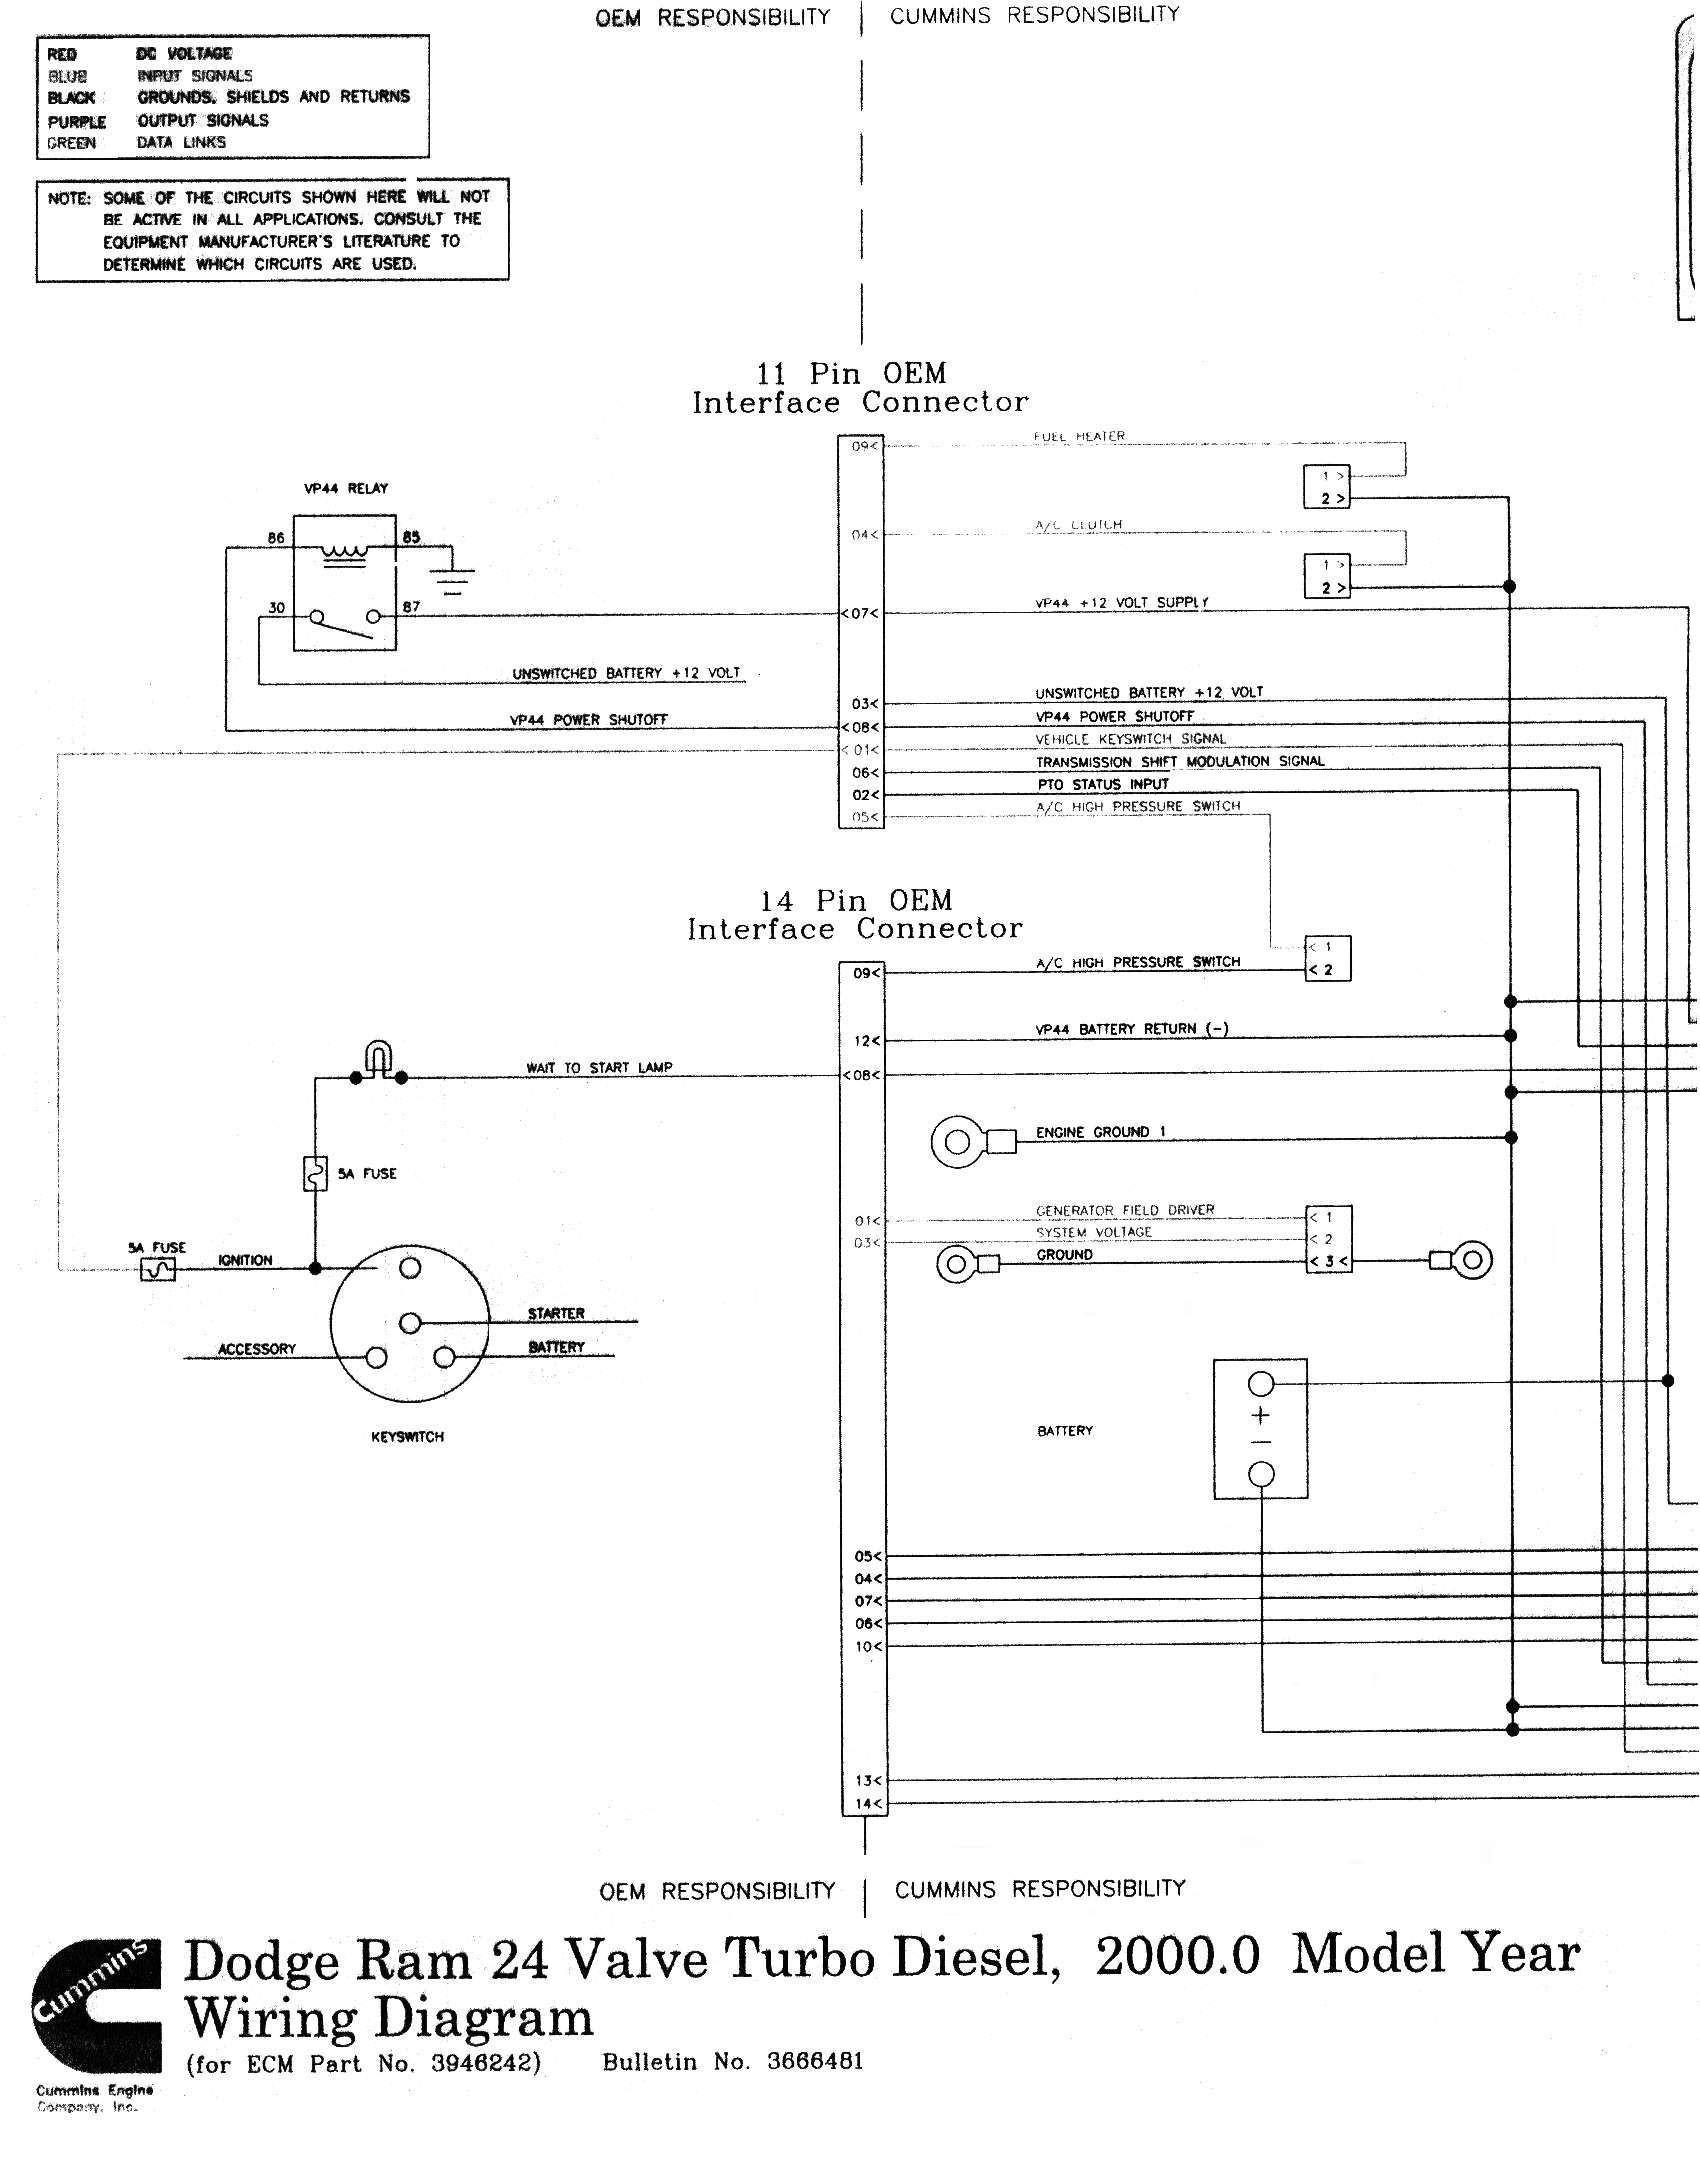 Dodge Ram 1500 Engine Diagram Dodge Cummins Diesel Fuel Line Diagram Dodge Obd Connector Wiring Of Dodge Ram 1500 Engine Diagram